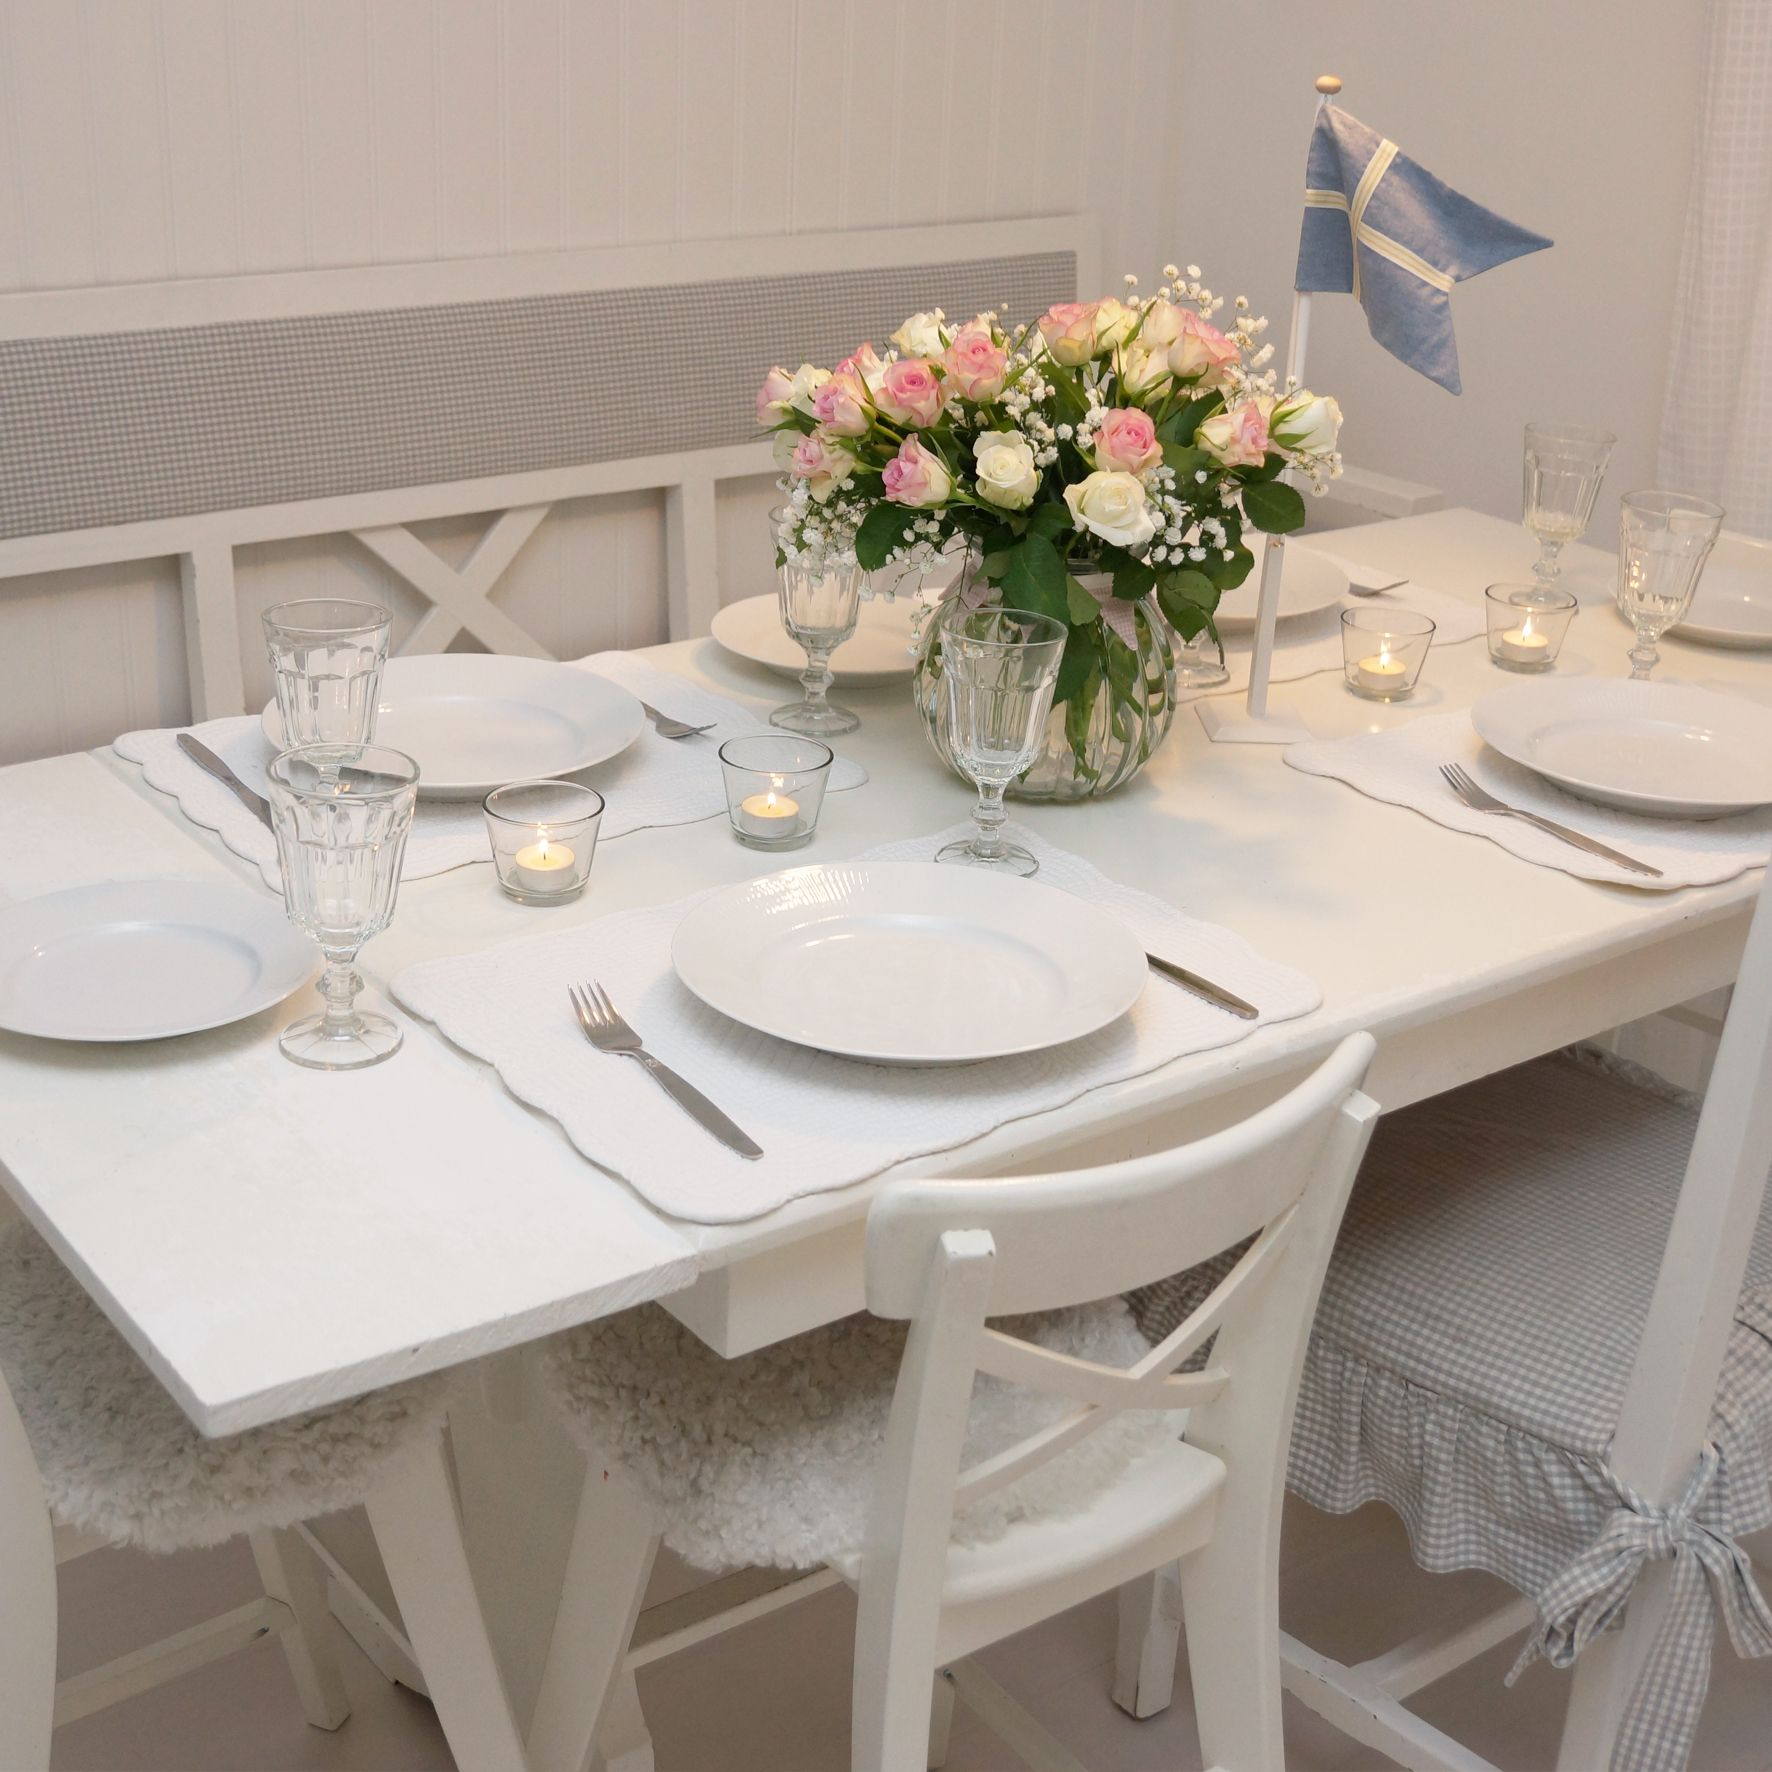 Birthday Table Setting. It's Scandinavian. Happy Birthday